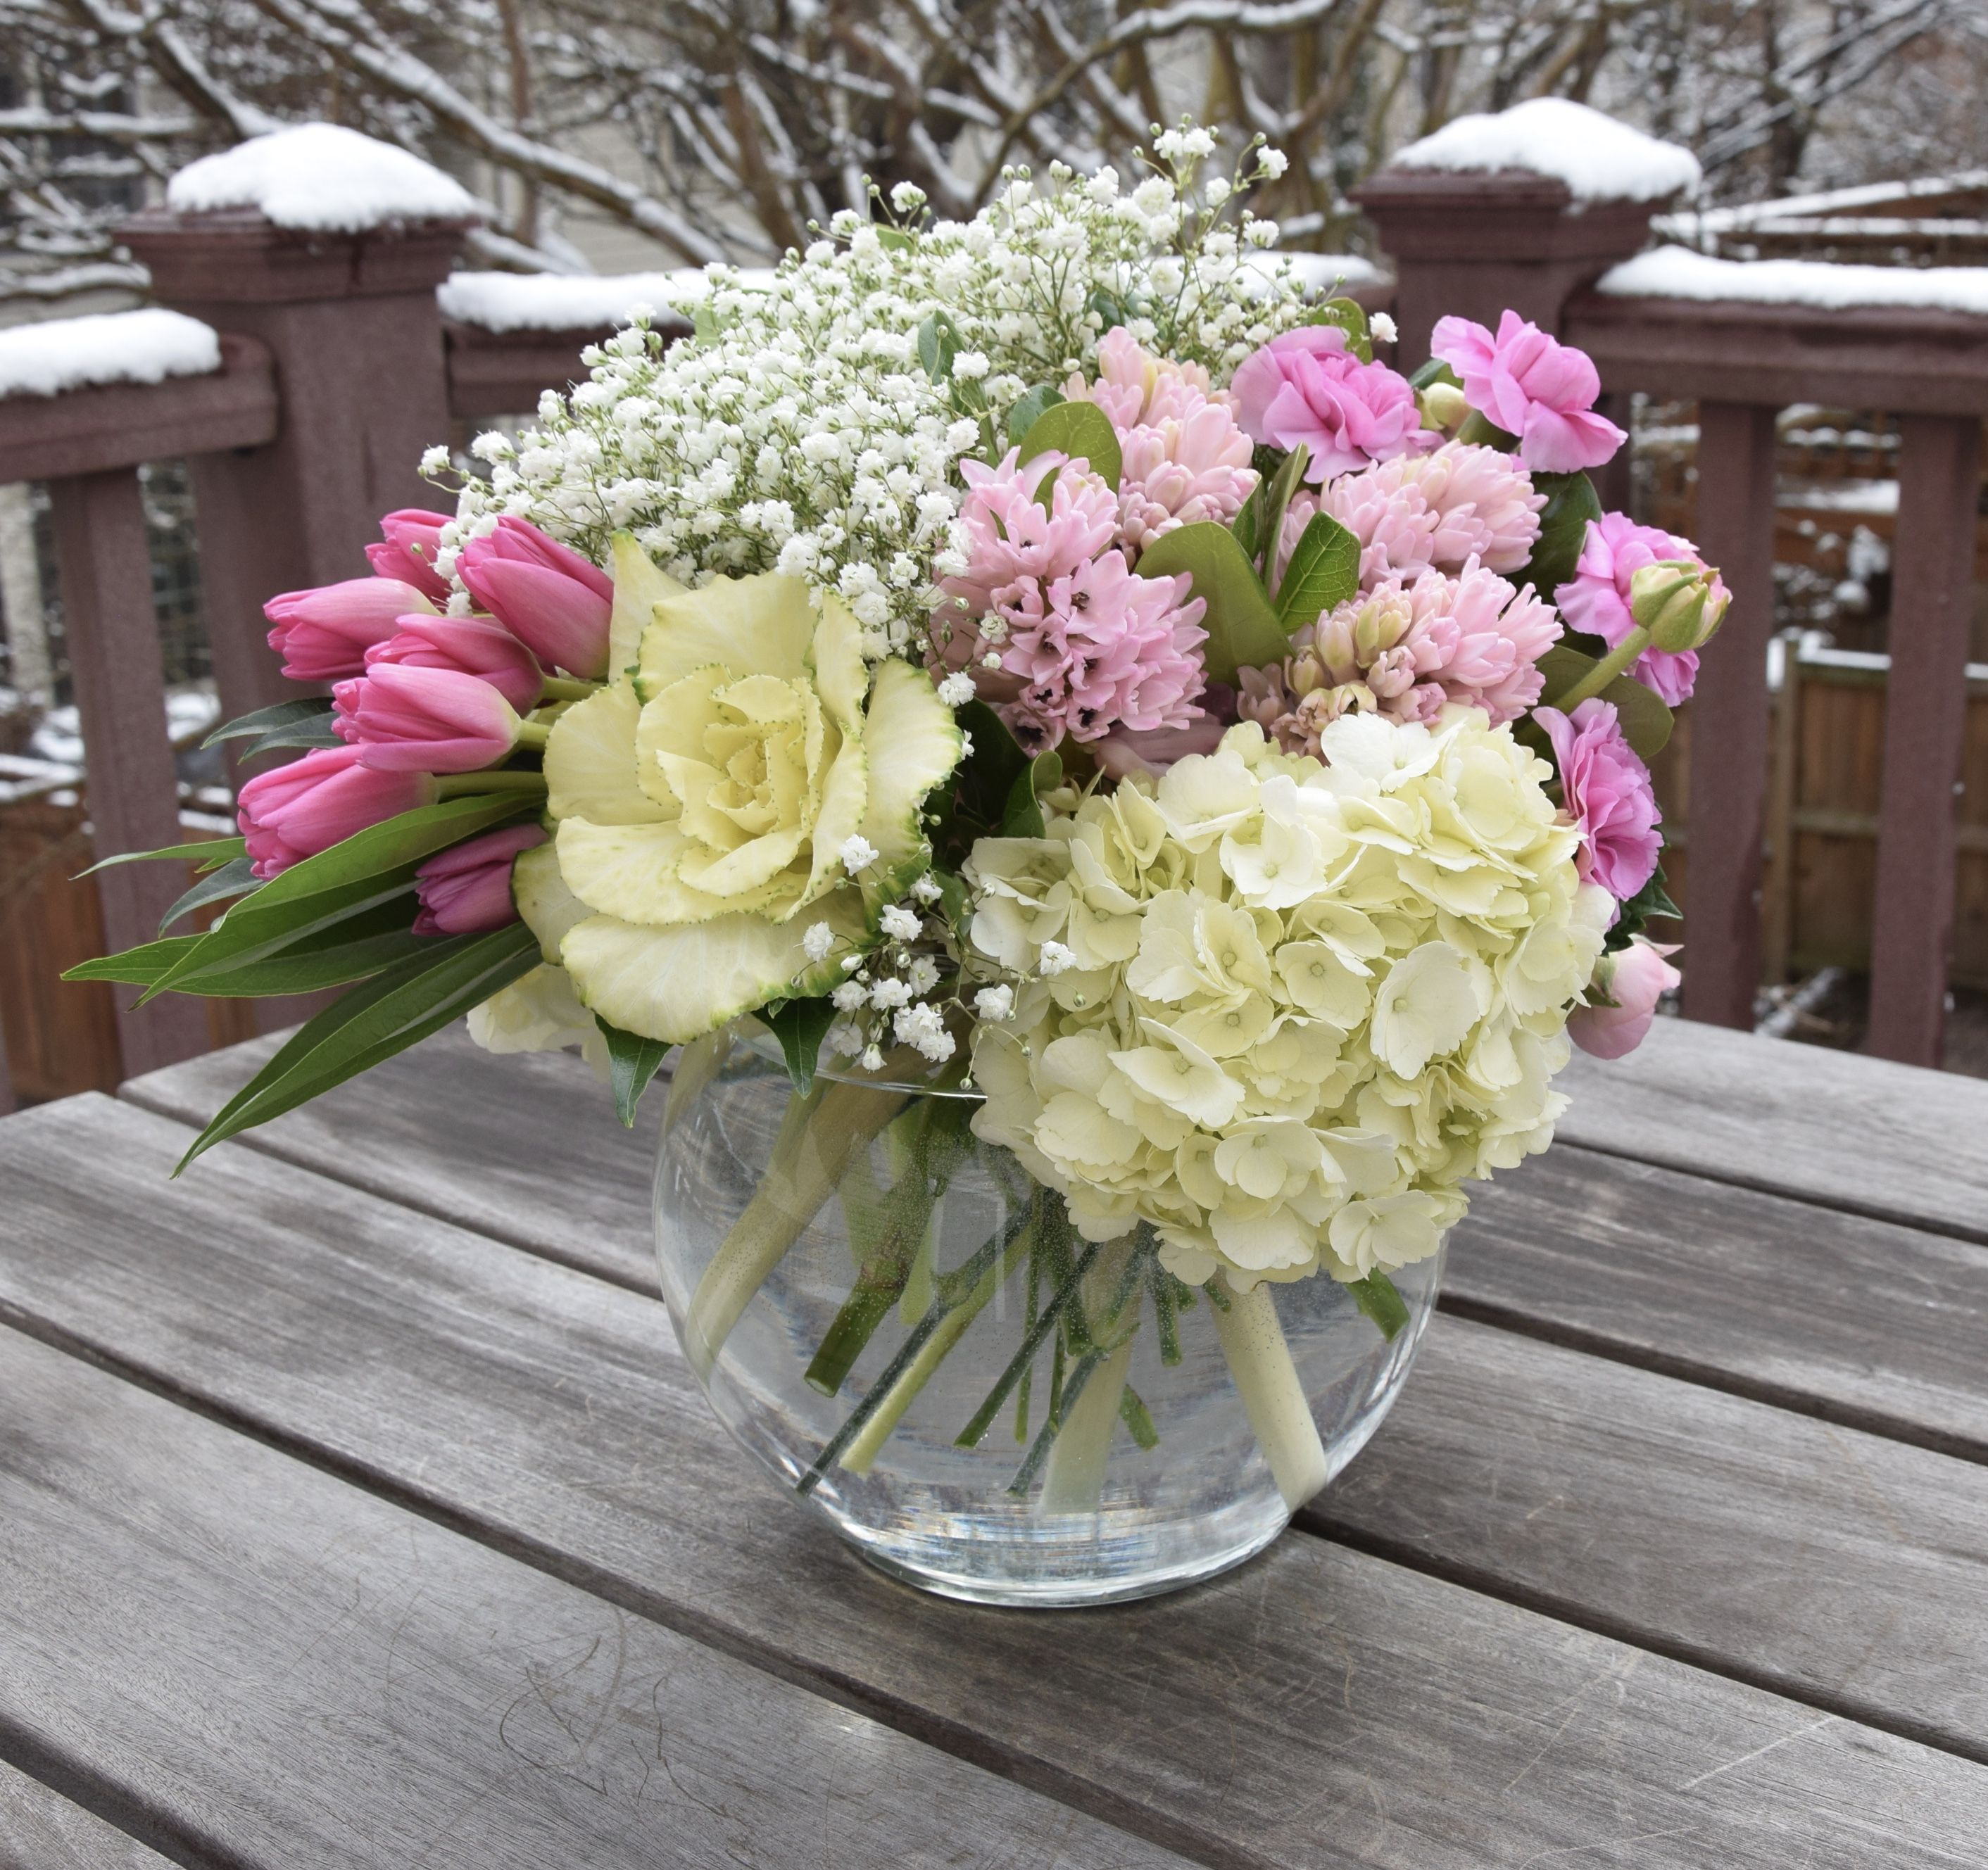 Flower Arrangement In A Glass Bowl Fresh Flowers Arrangements Beautiful Flowers Garden Flower Vases